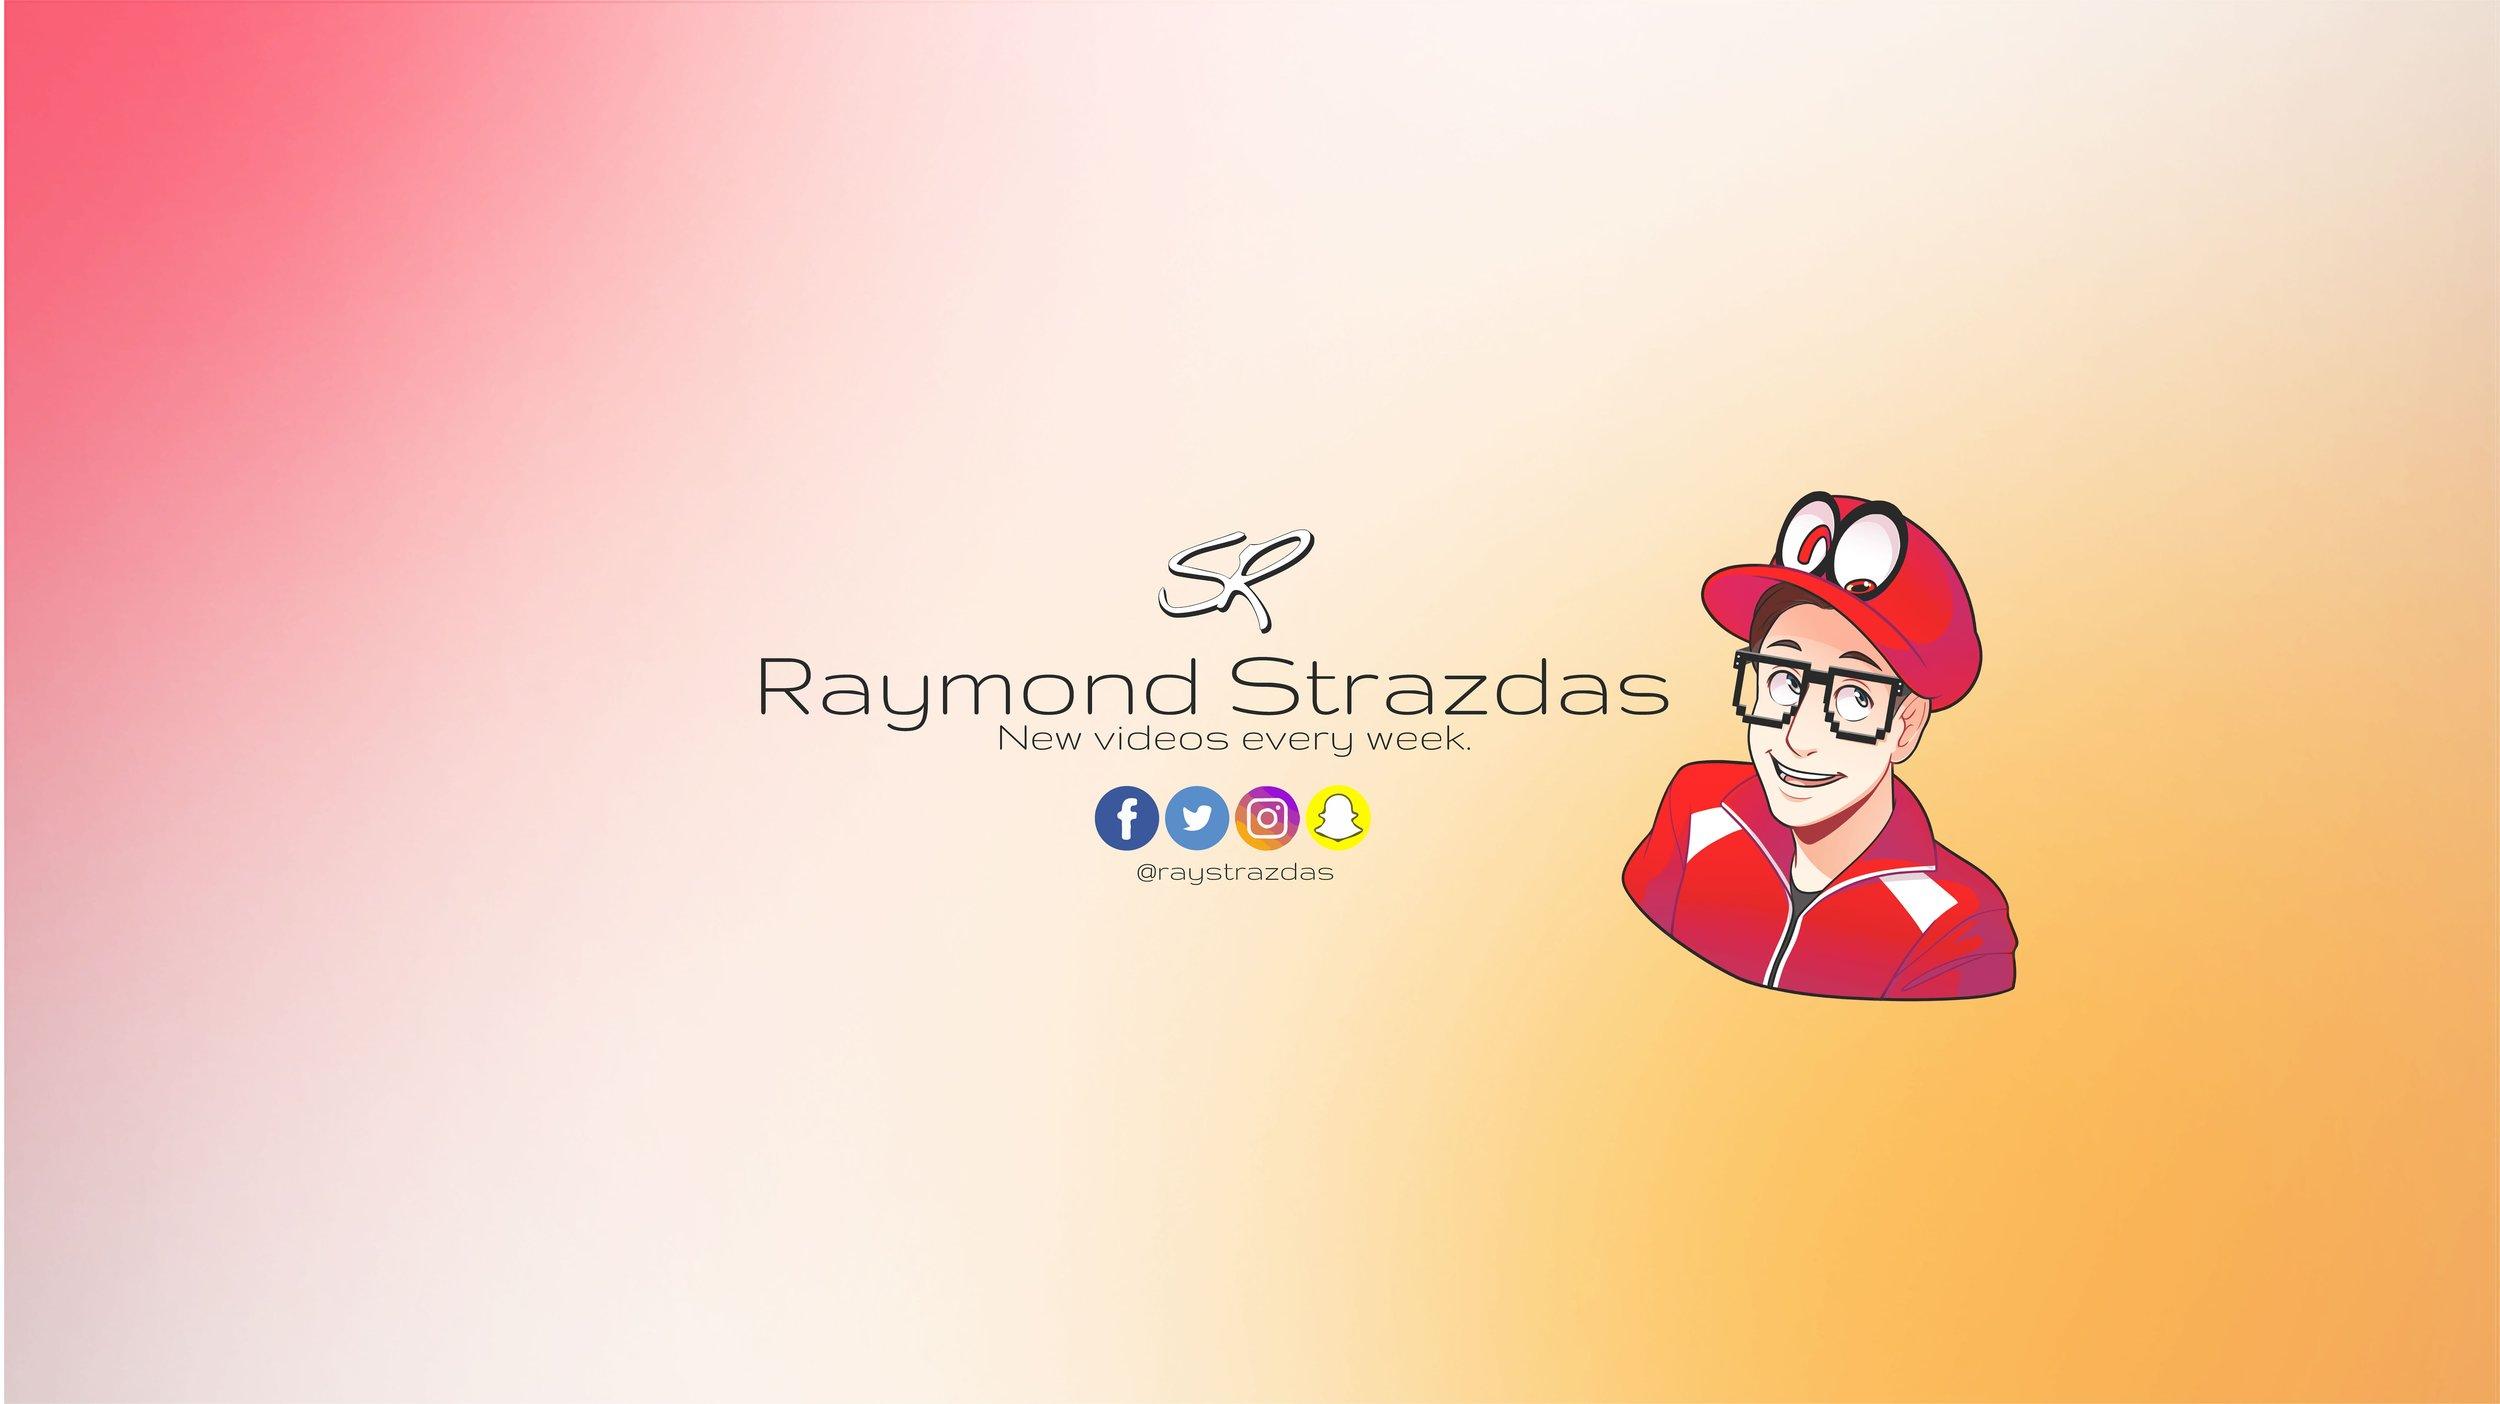 R18-Raymond-Strazdas-YouTube-Cover-Photo-2018.jpg